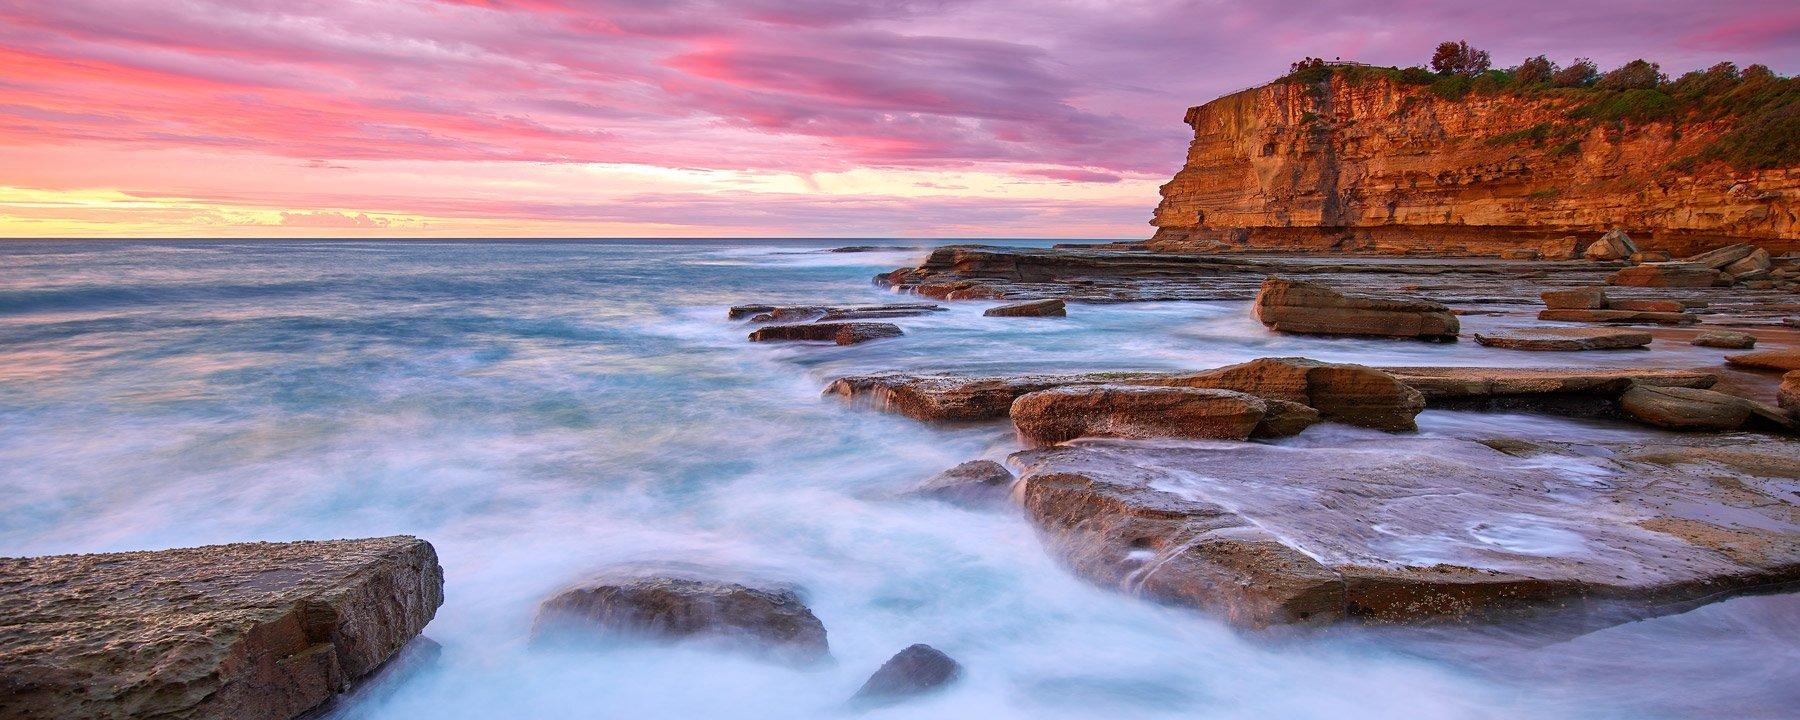 A pastel sunrise over the Skillion, Terrigal, NSW, Australia.